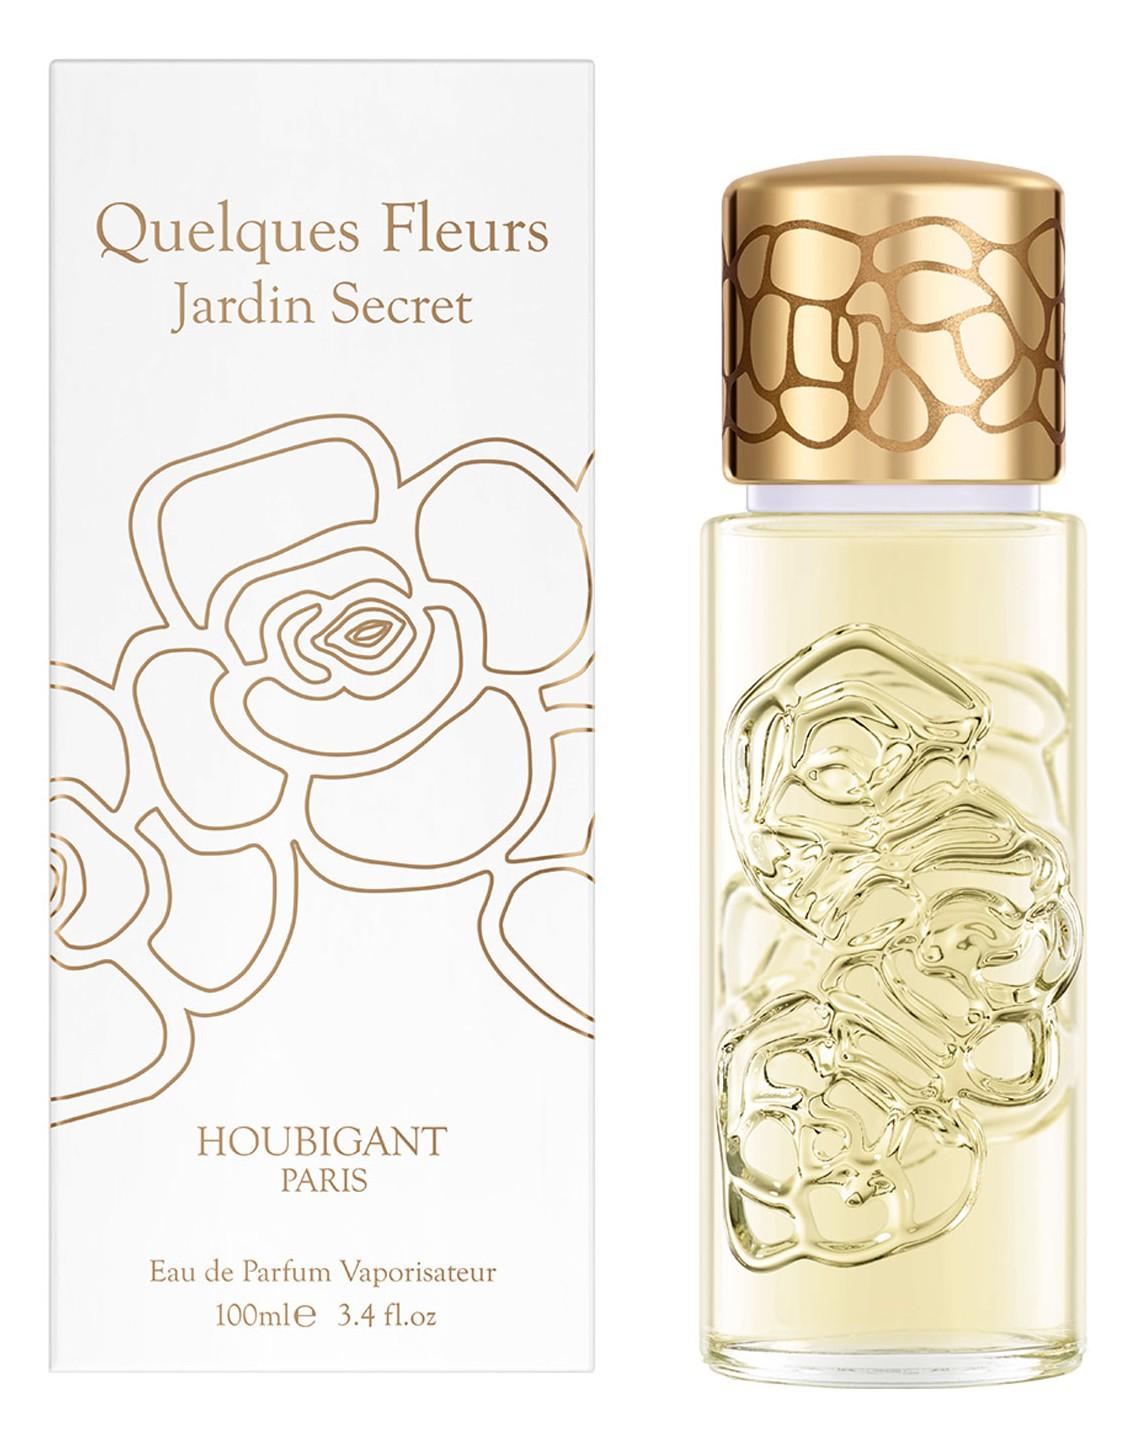 Houbigant Quelques Fleurs Jardin Secret аромат для женщин